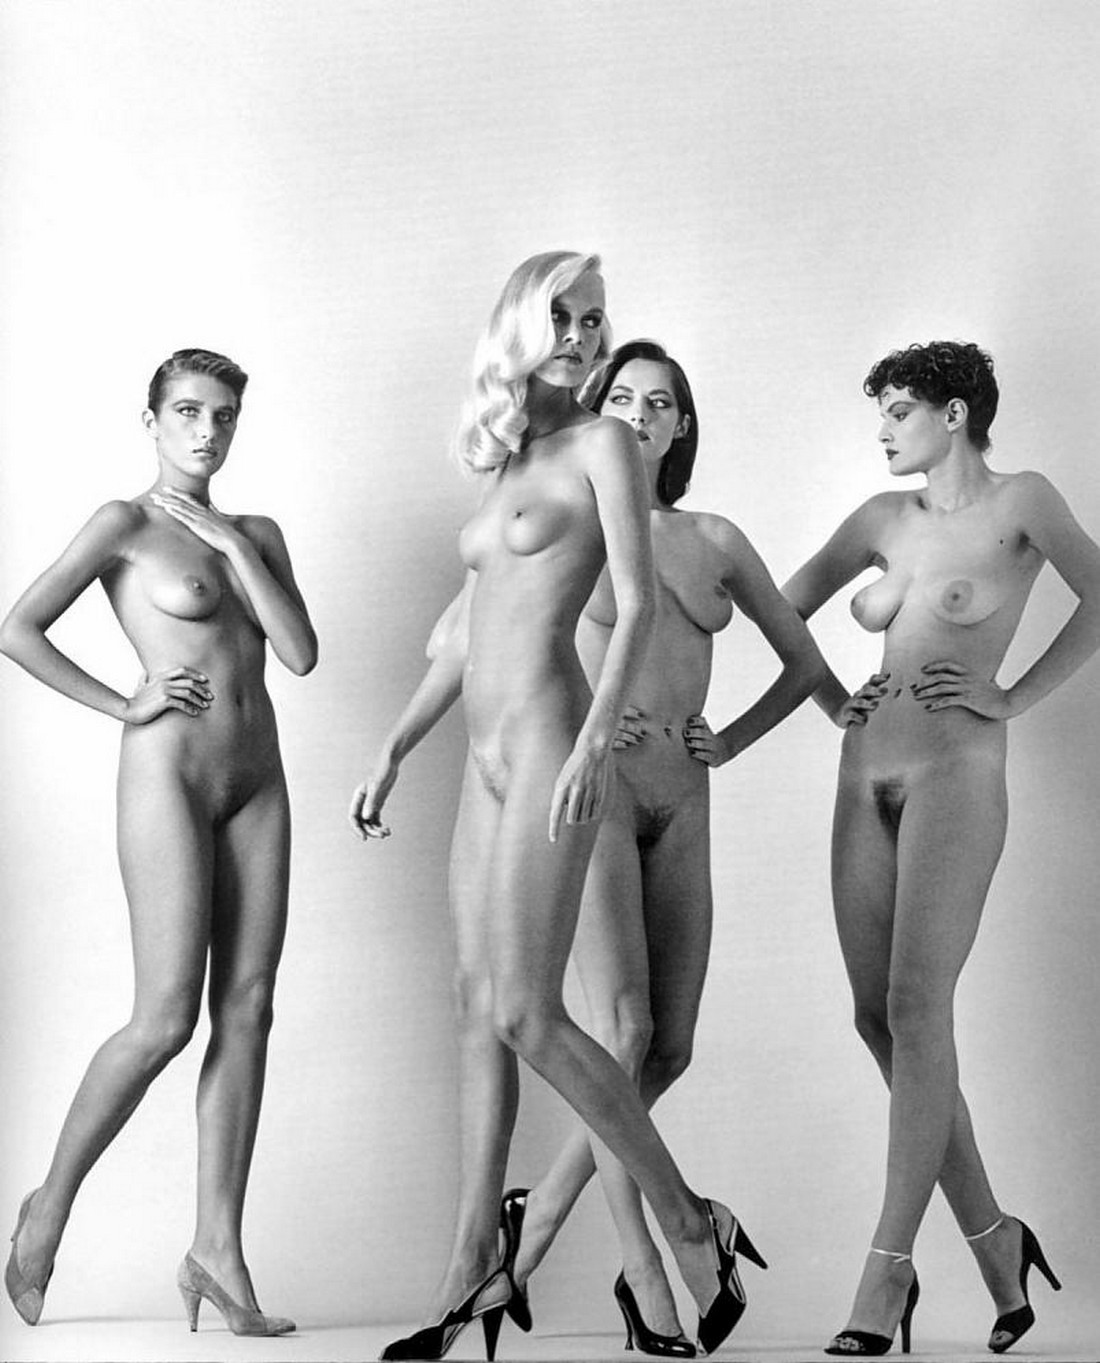 Twenties nudes